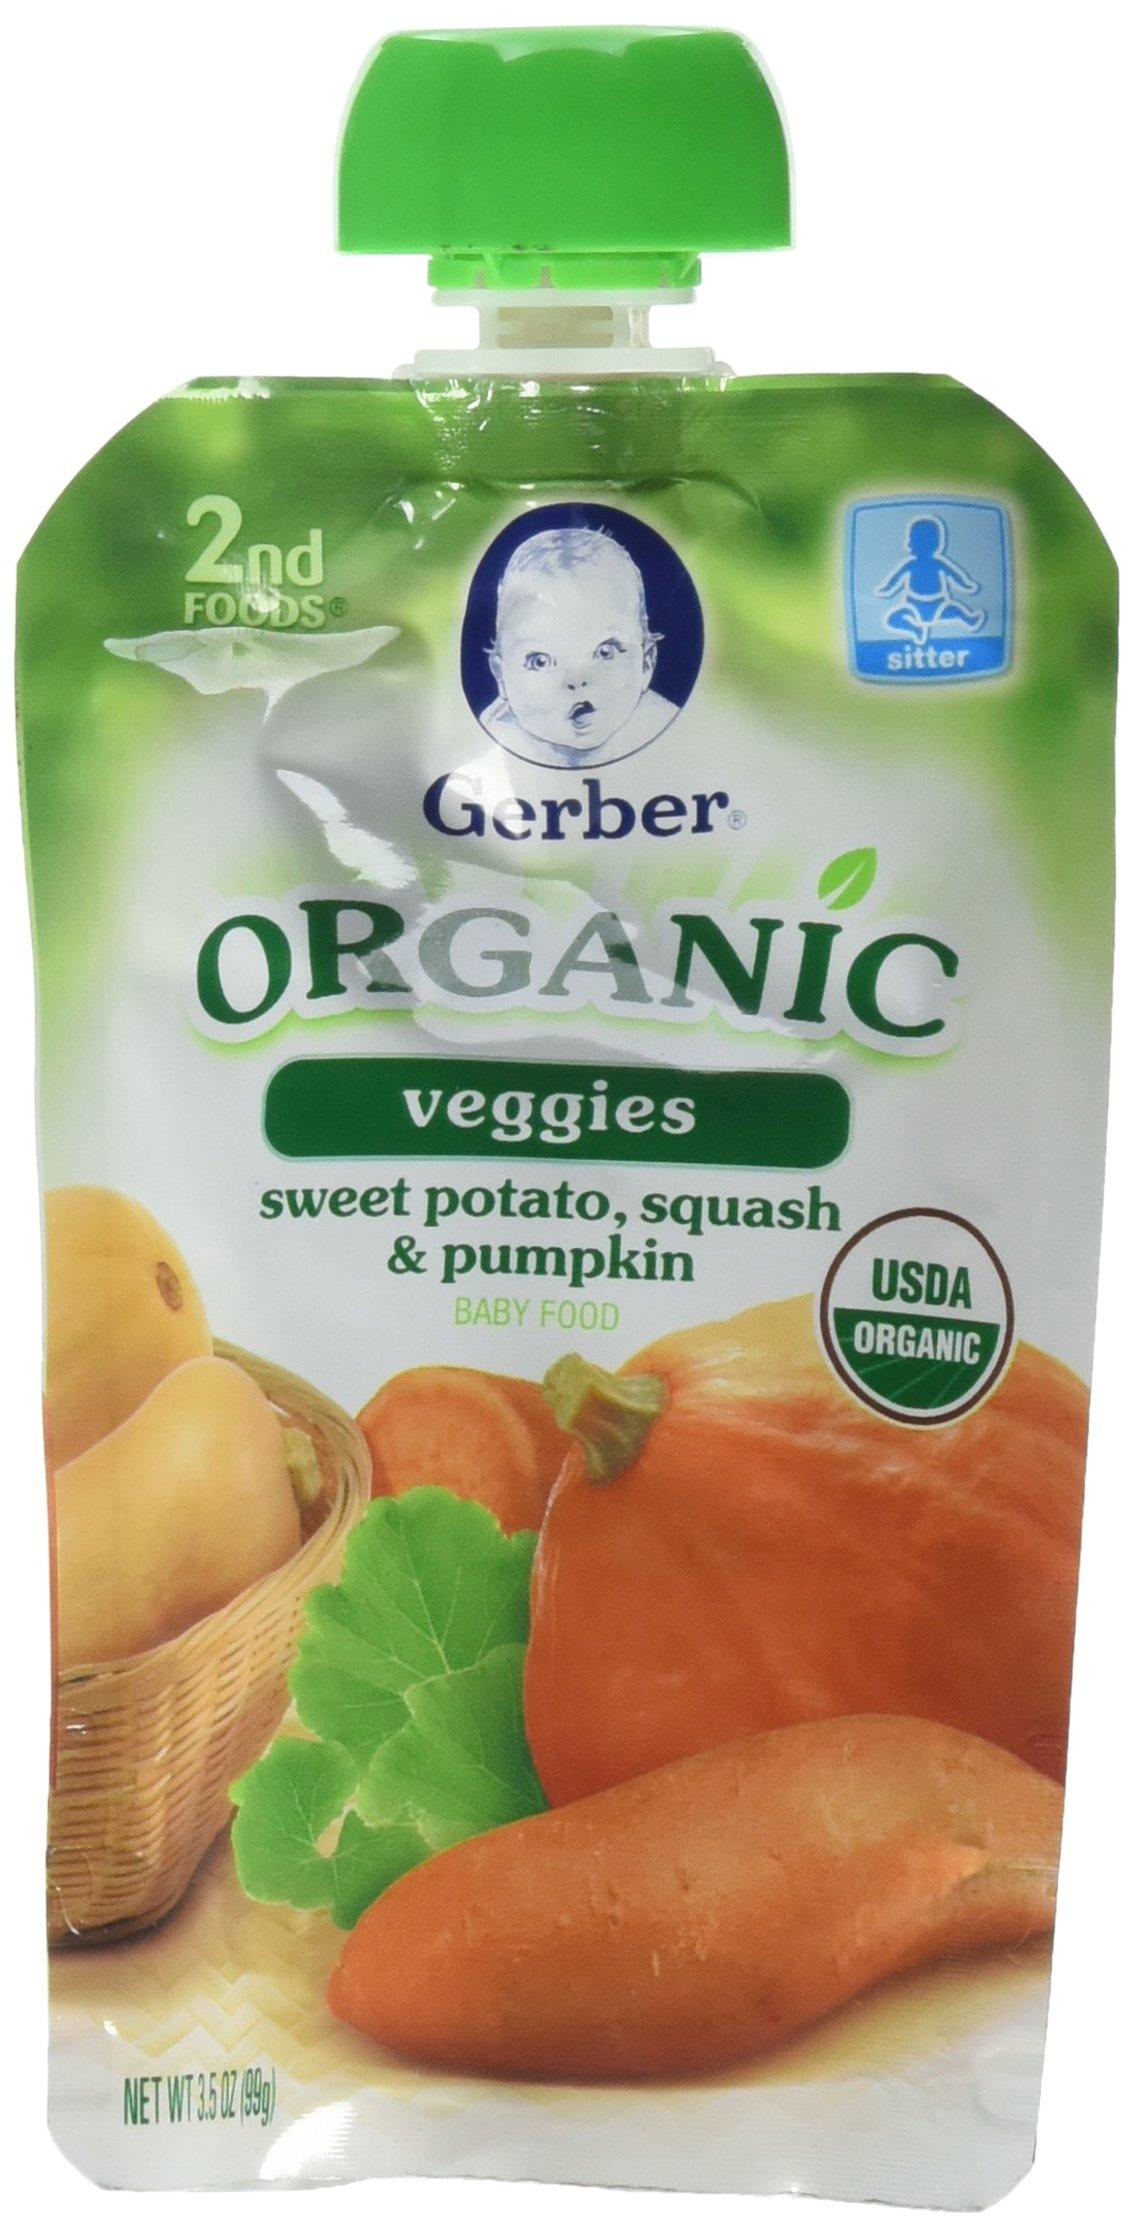 Gerber  Organic 2Nd Foods Baby Food, Veggies Sweet Potato Squash & Pumpkin, 3.5 oz